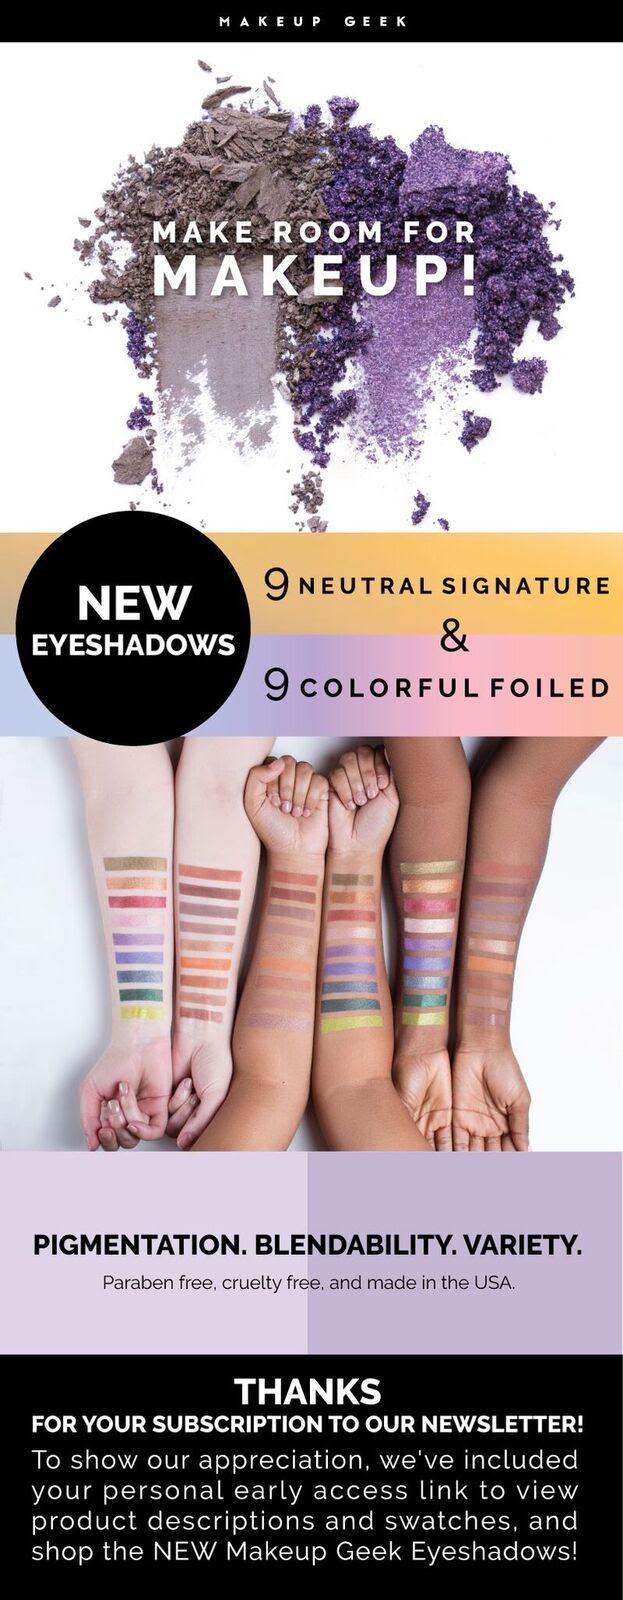 https://www.makeupgeek.com/makeup-geek-foiled-eyeshadow-expansion-set-10-pans-1.html